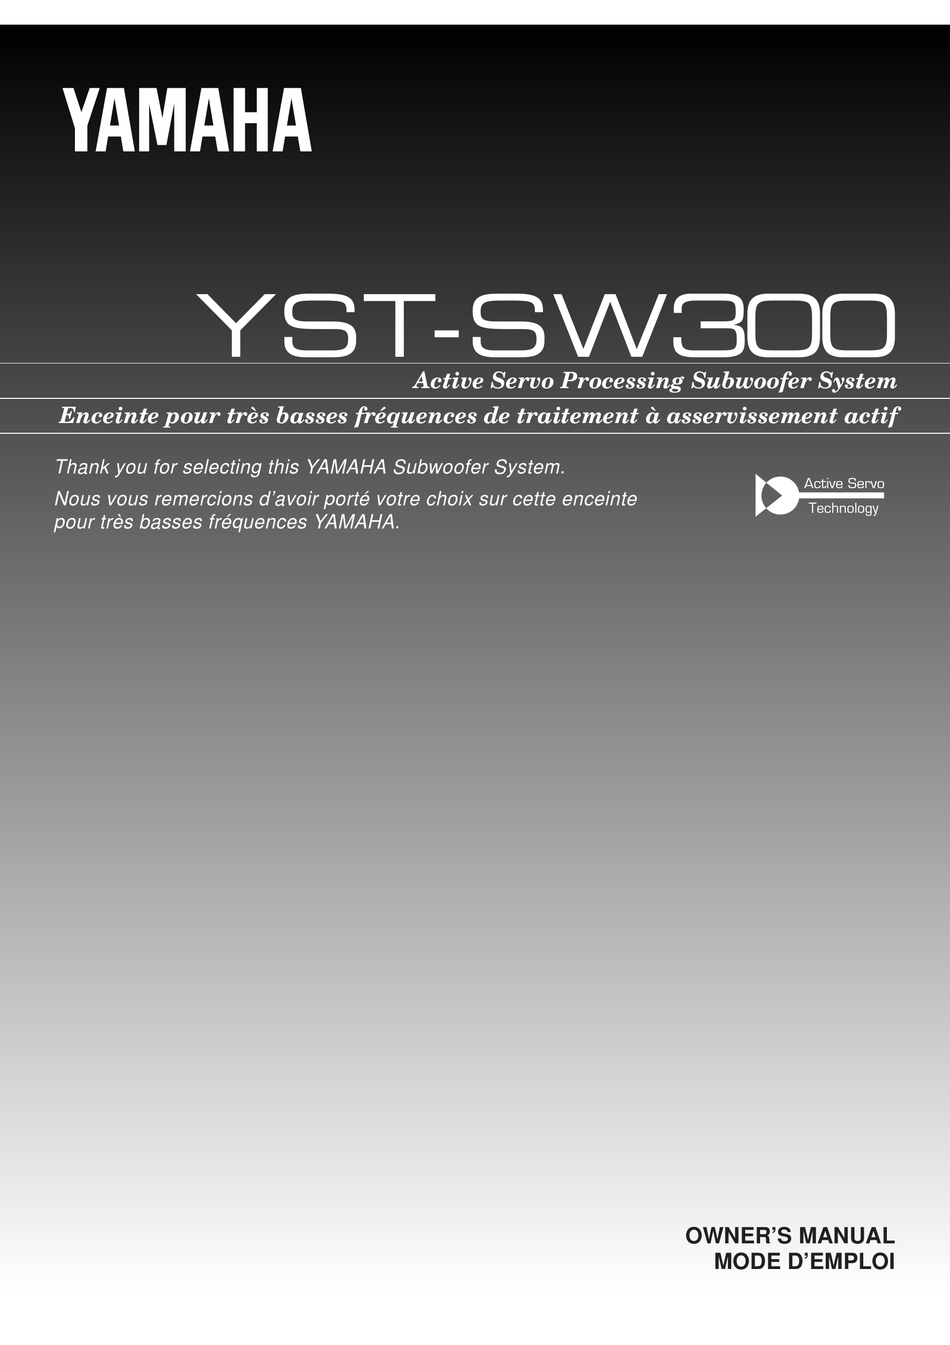 YAMAHA YST-SW300 OWNER'S MANUAL Pdf Download